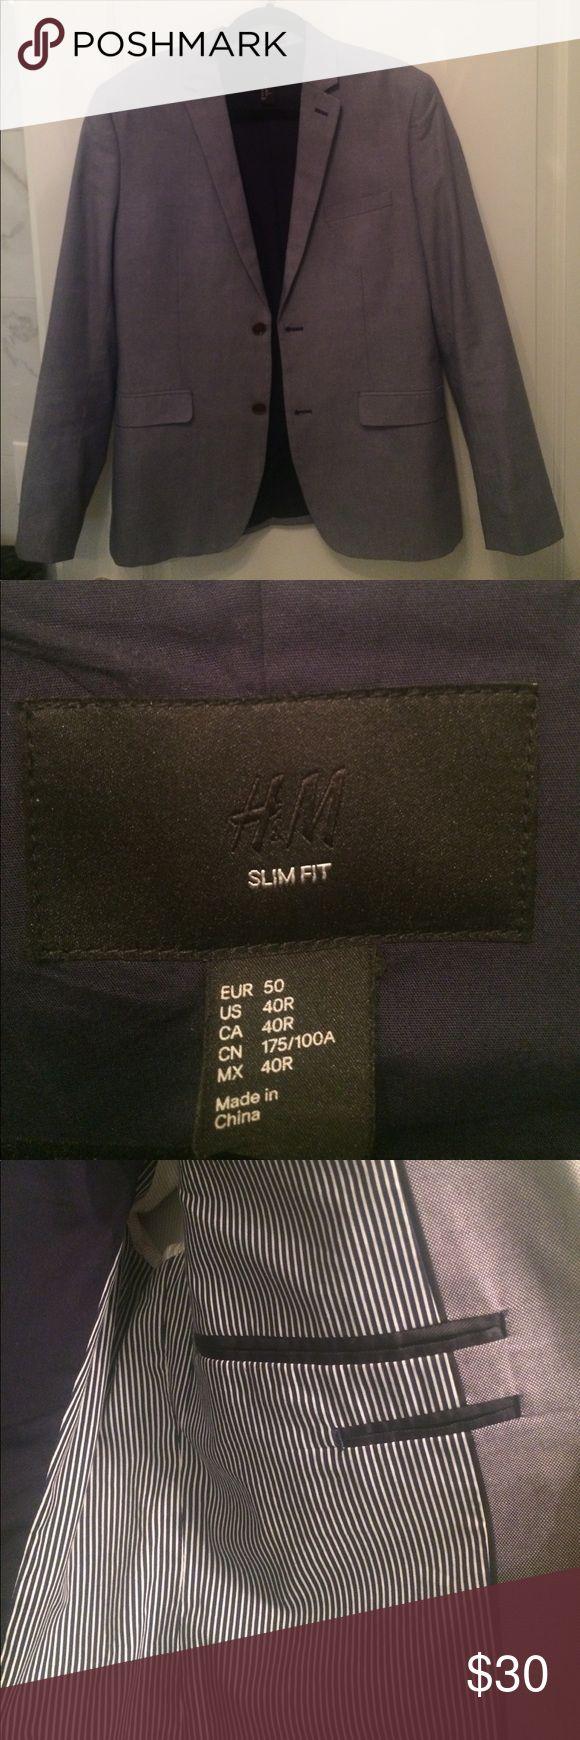 H&M SLIM FIT Blazer H&M SLIM FIT Blazer - Size: 40R - Blue - brown buttons - 6 pockets H&M Suits & Blazers Sport Coats & Blazers